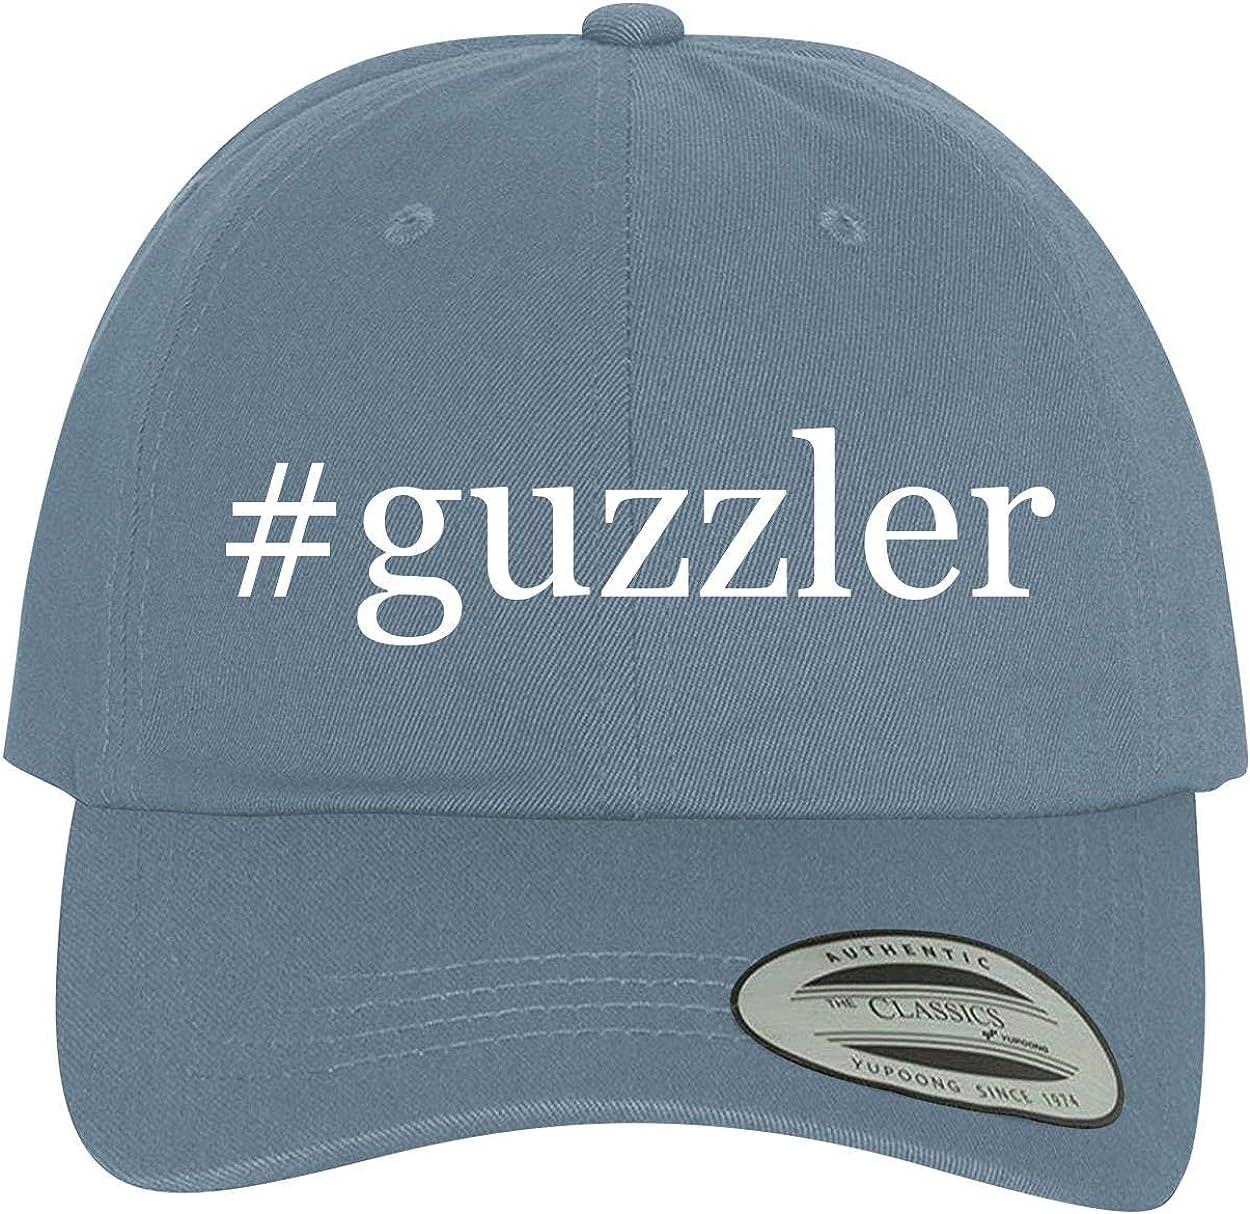 Comfortable Dad Hat Baseball Cap BH Cool Designs #Guzzler